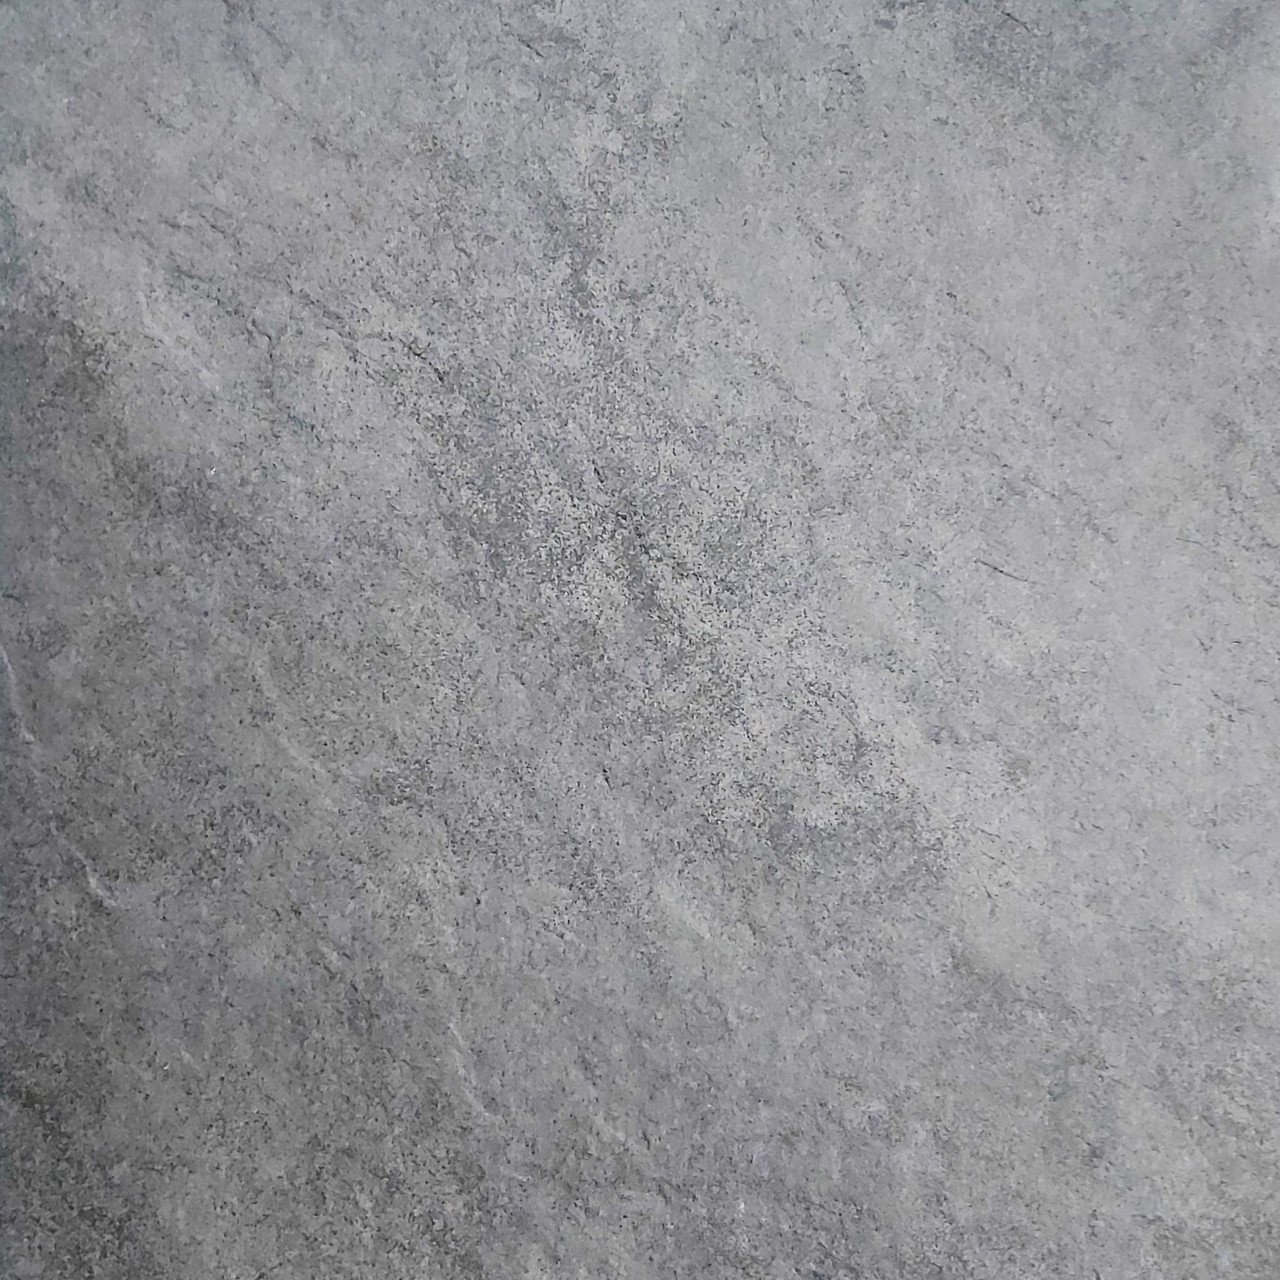 Плитка для пола ГРЕС ректиф. 600x600x20 R S Sierra Anthrazit сорт S